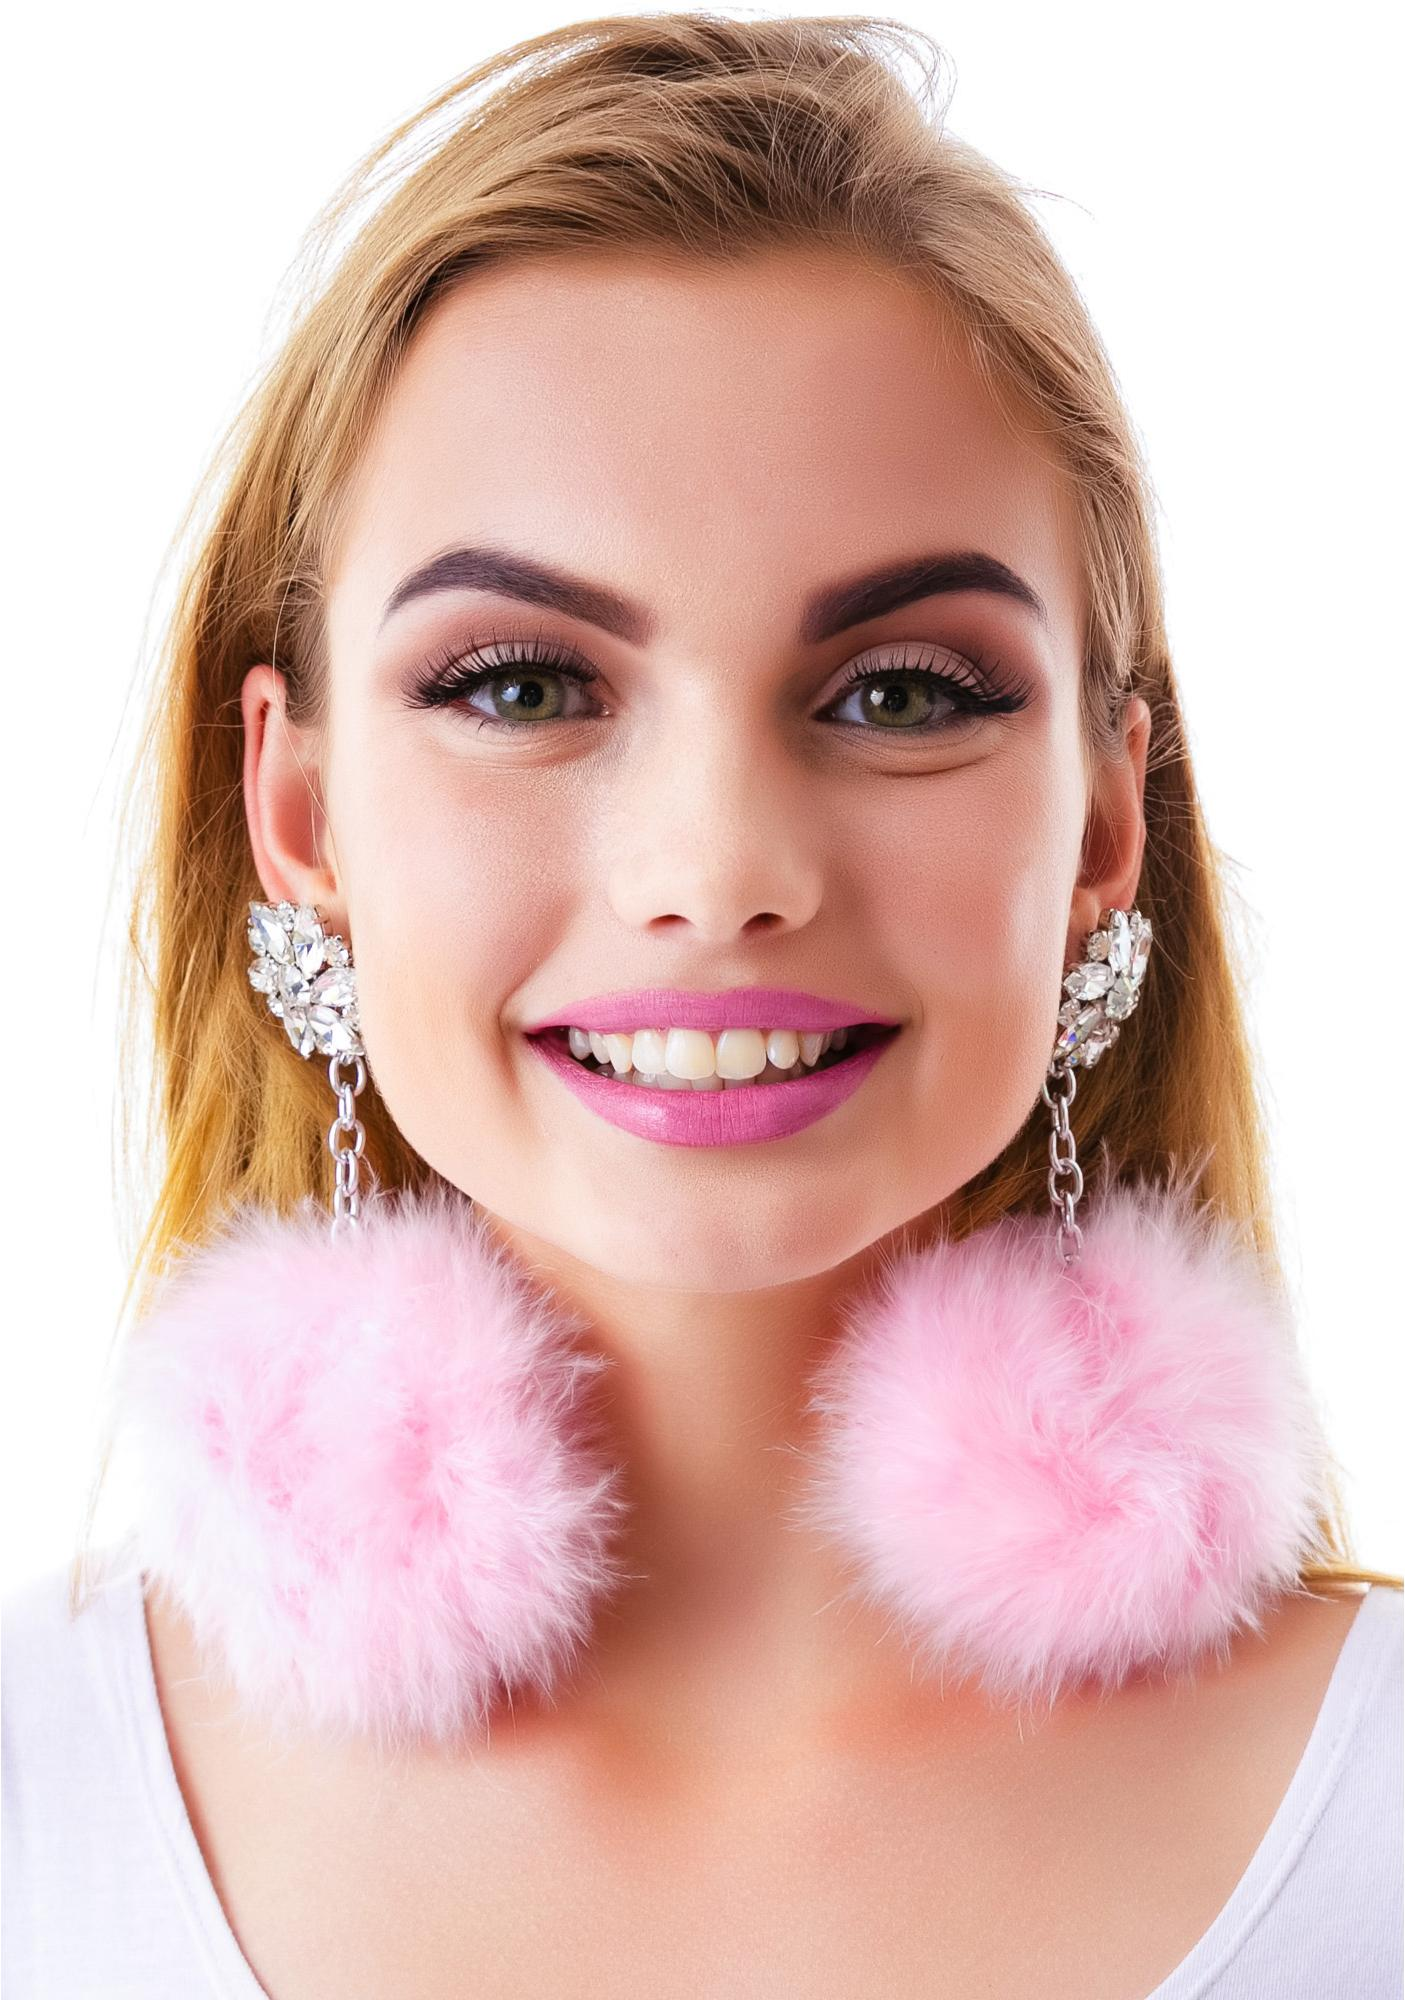 Diamond Dollz Pom Pom Earrings